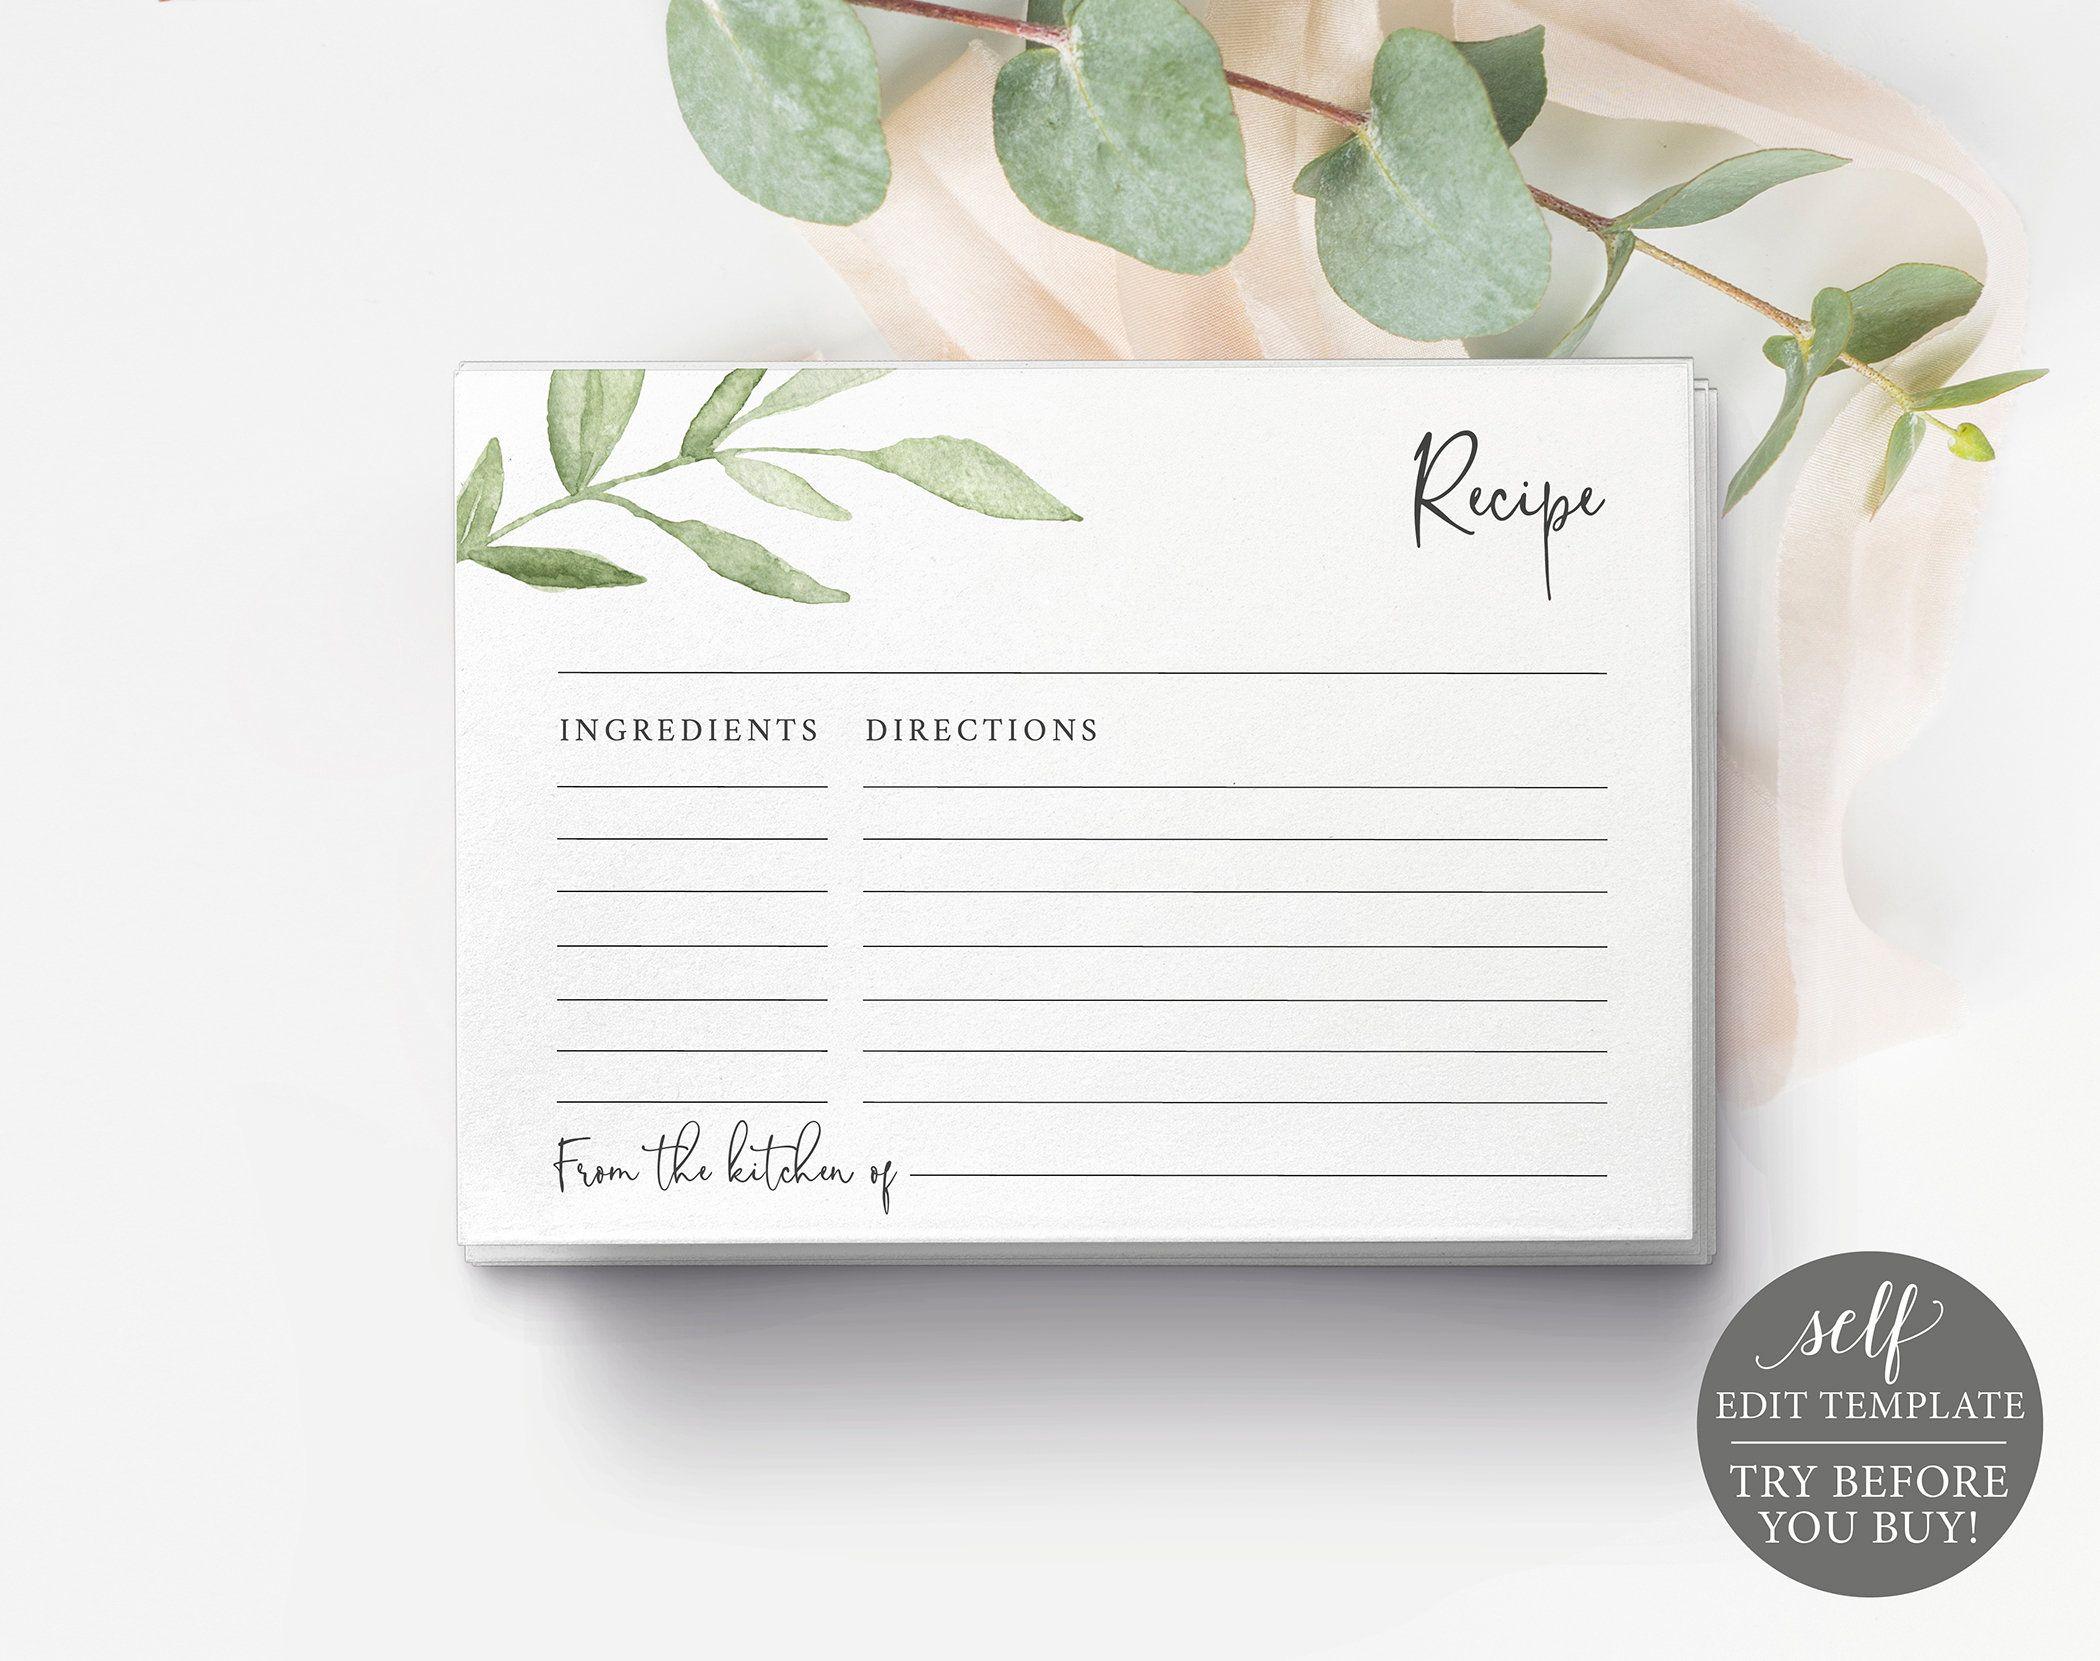 Recipe Card Template Greenery Leaves Editable Printable Etsy Recipe Cards Template Wedding Invitations Printable Templates Recipe Cards